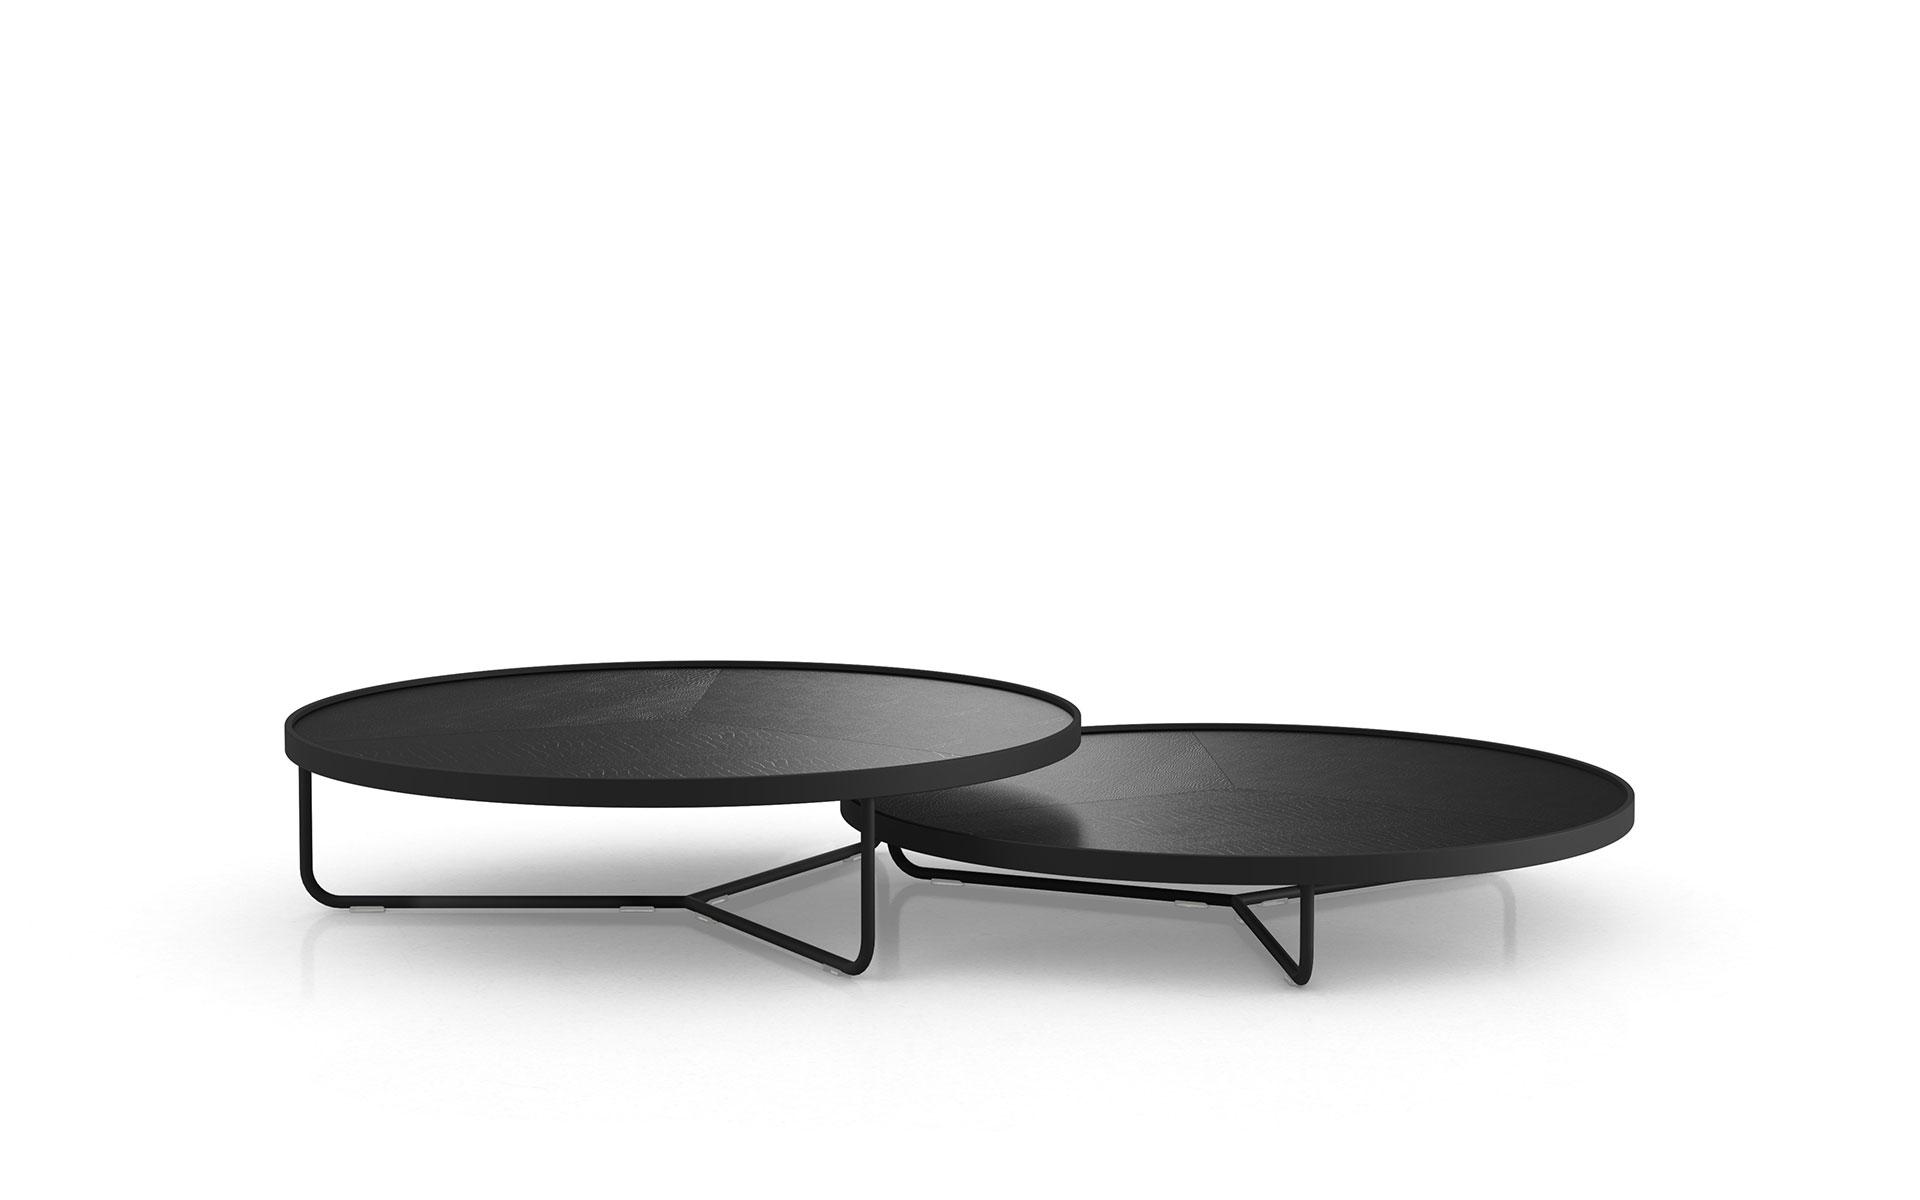 Adelphi Coffee Tables